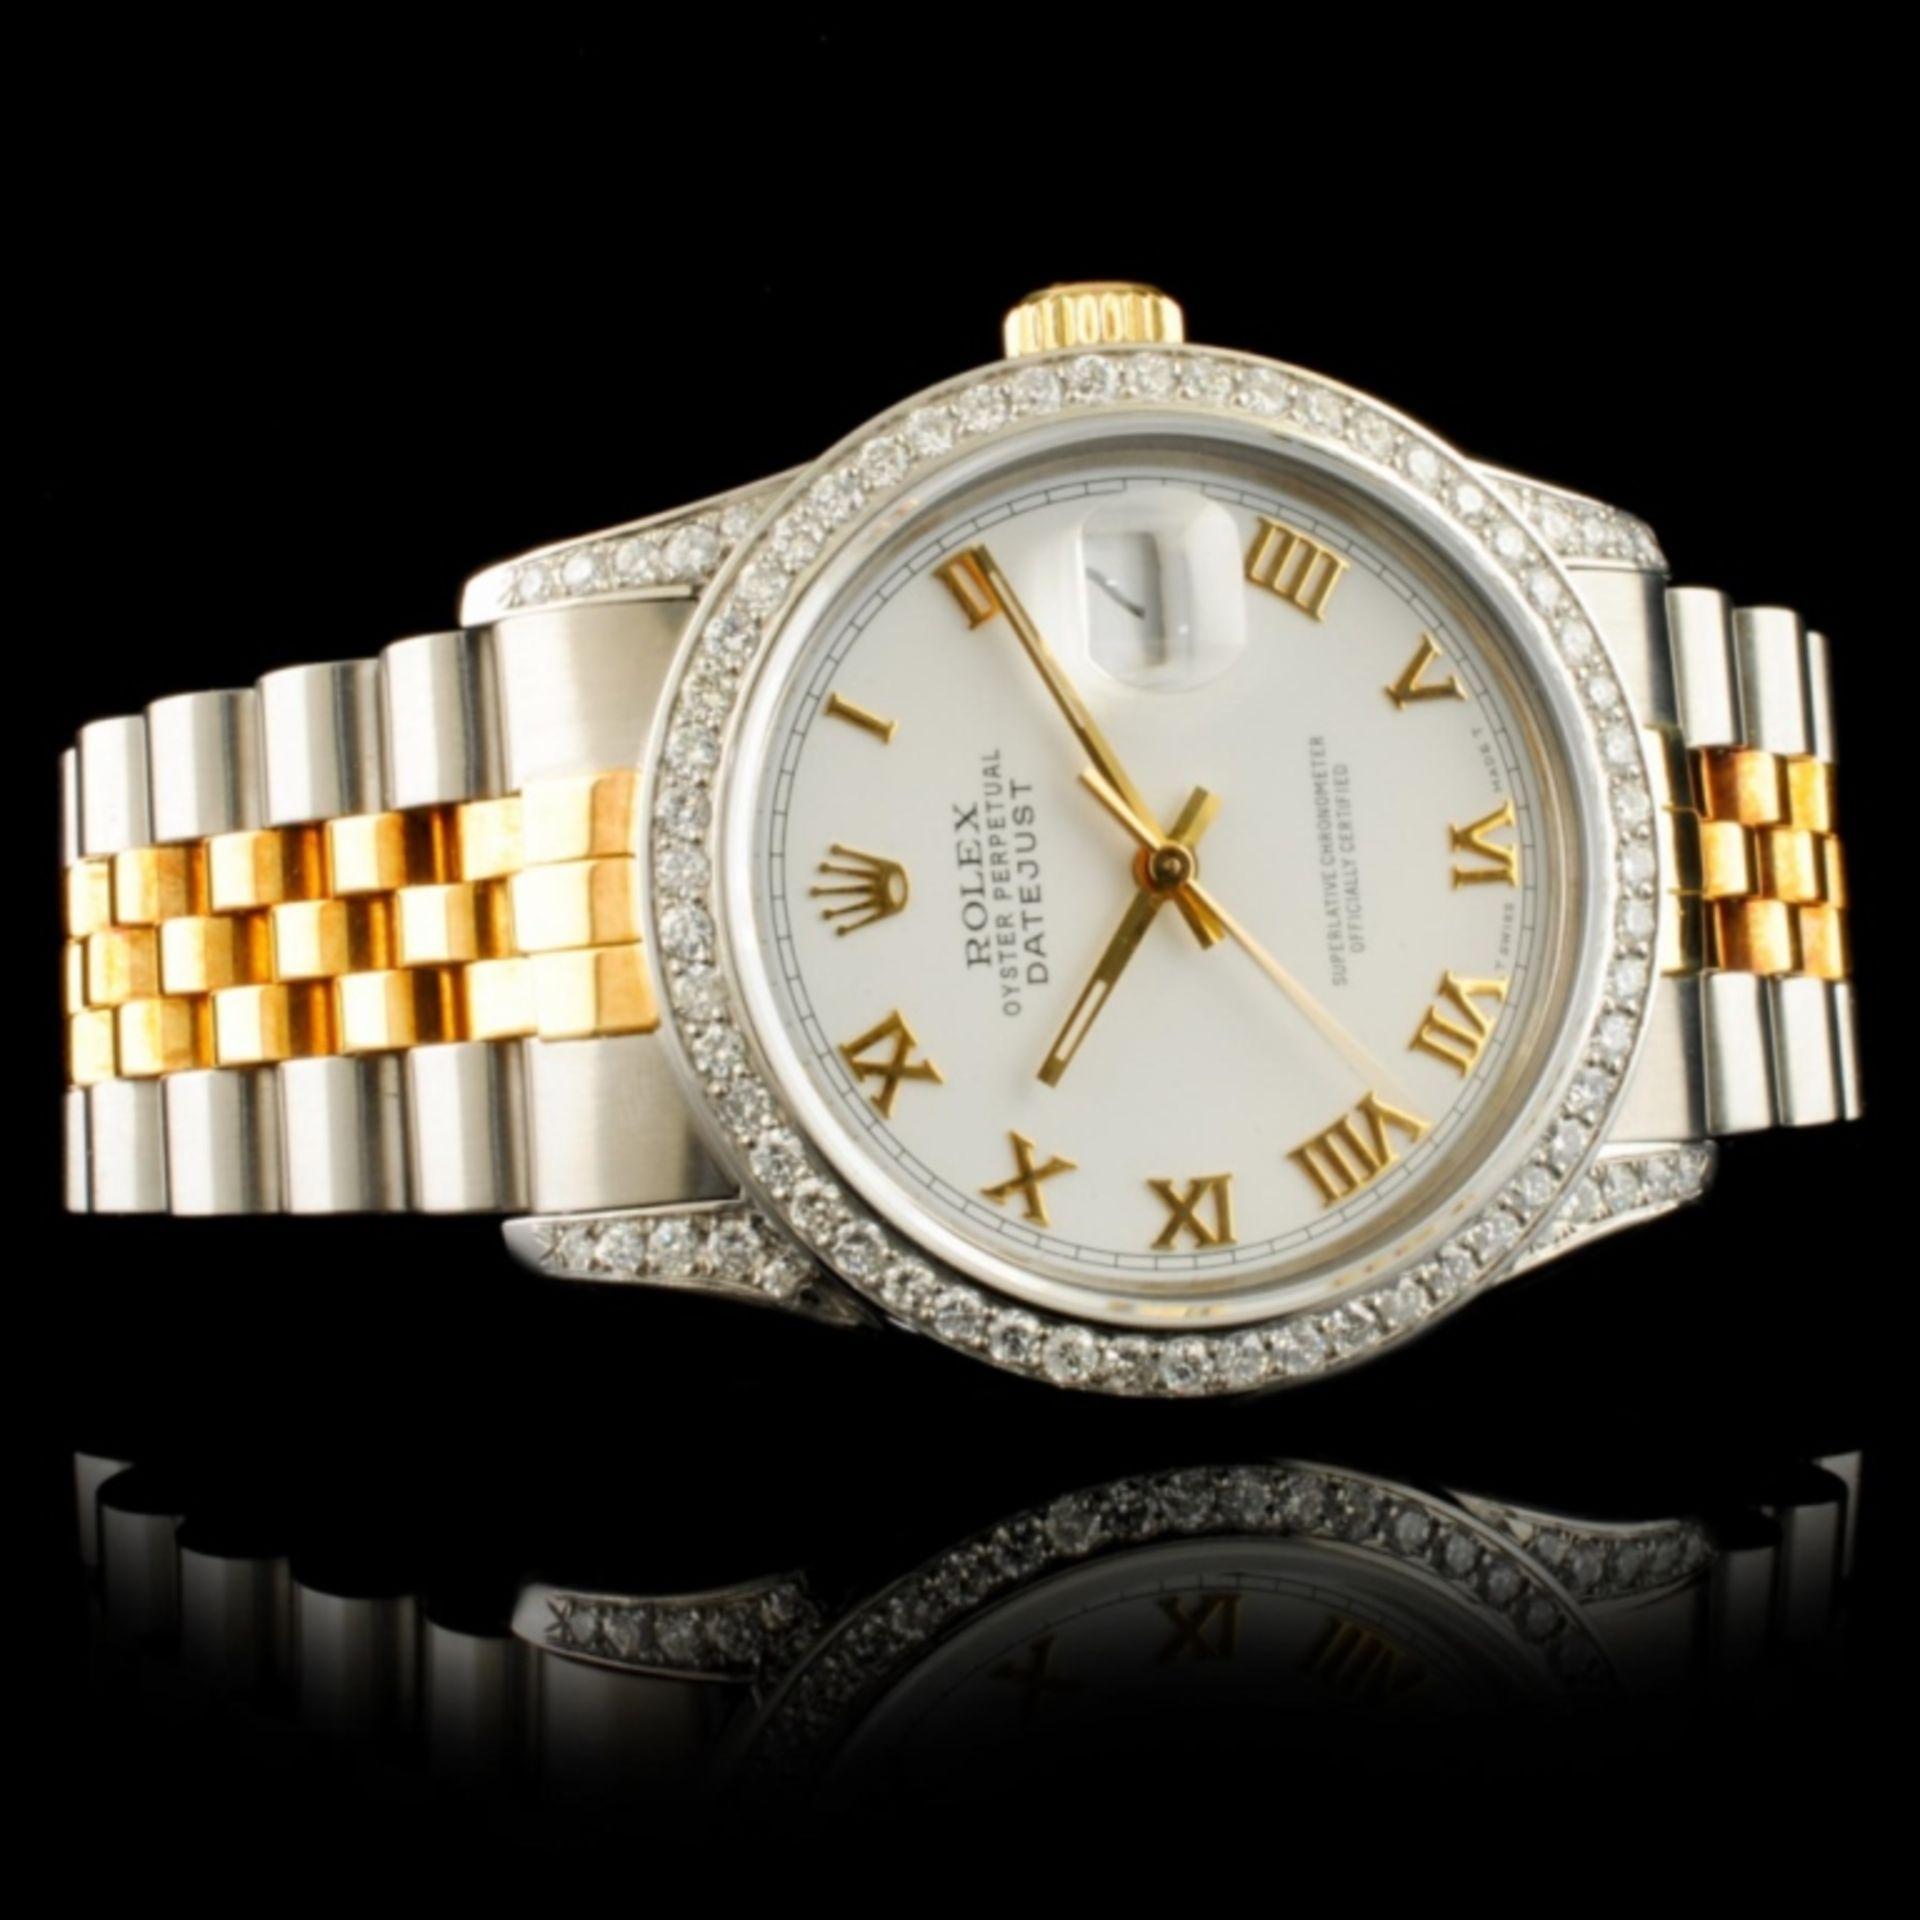 Rolex DateJust 1.50ctw Diamond 36MM Wristwatch - Image 3 of 5